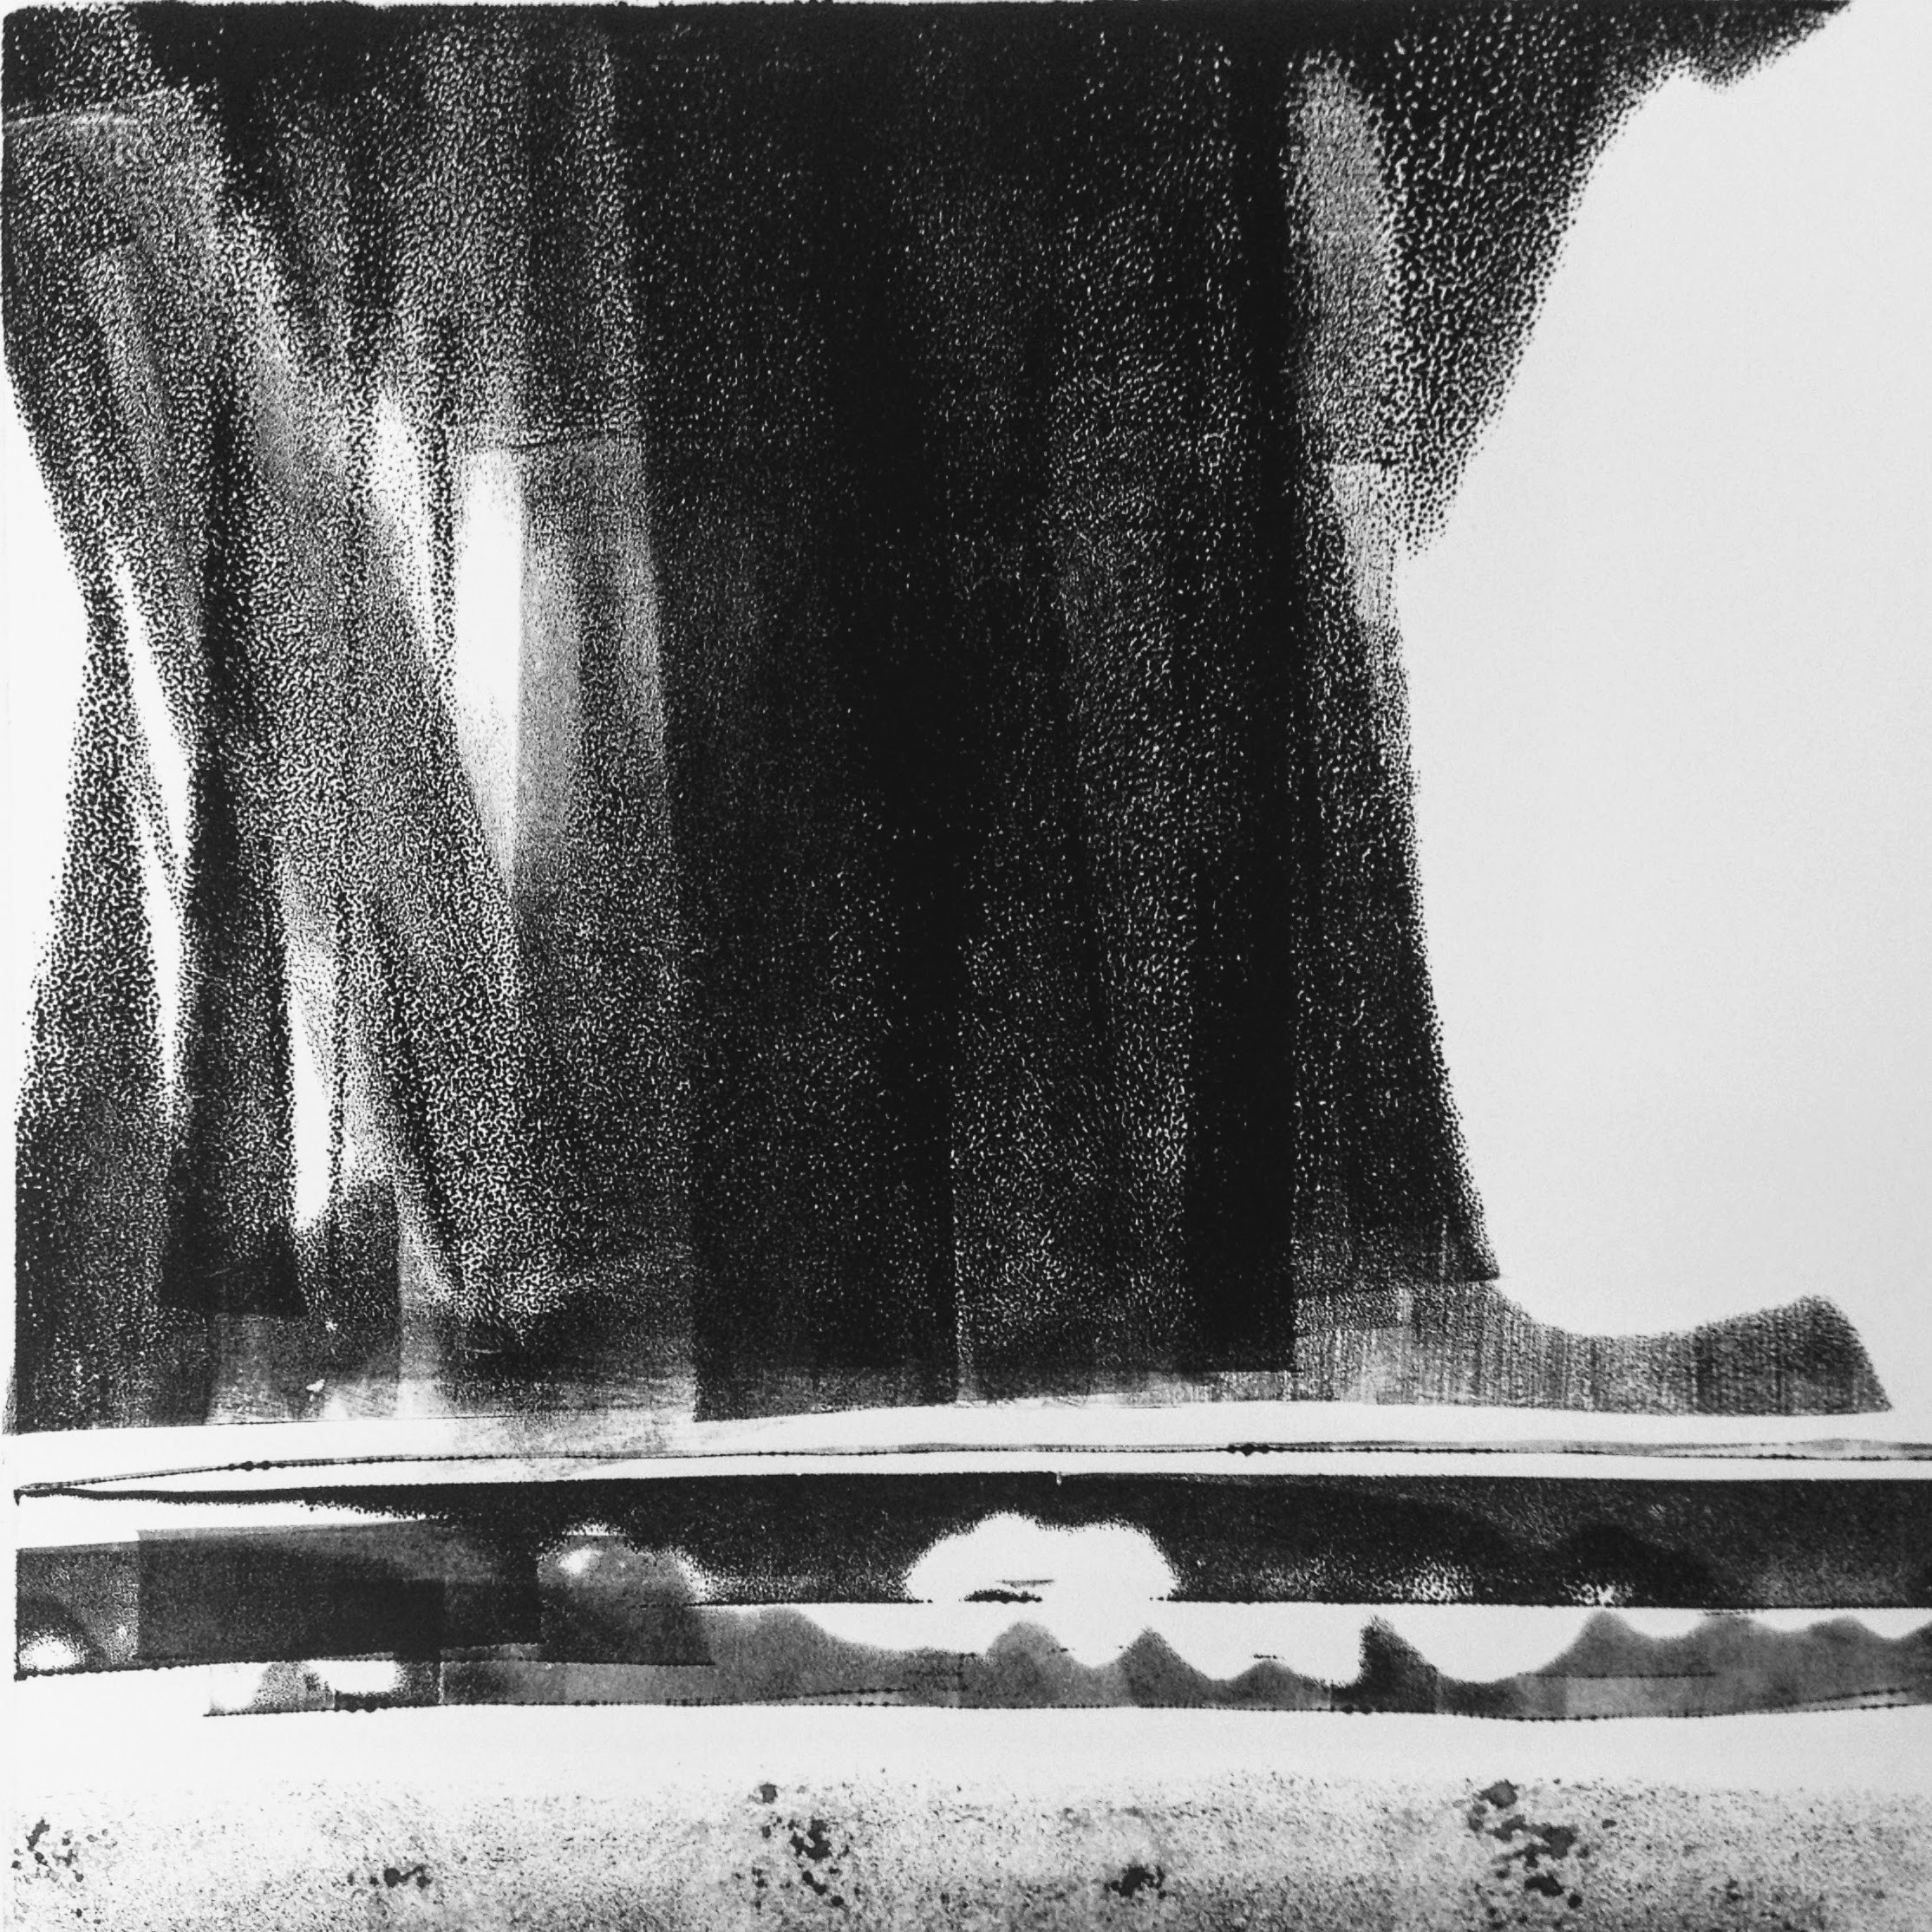 Dark Skies VI, monotype, 2017, 300x300mm, 250gm Somerset Satin